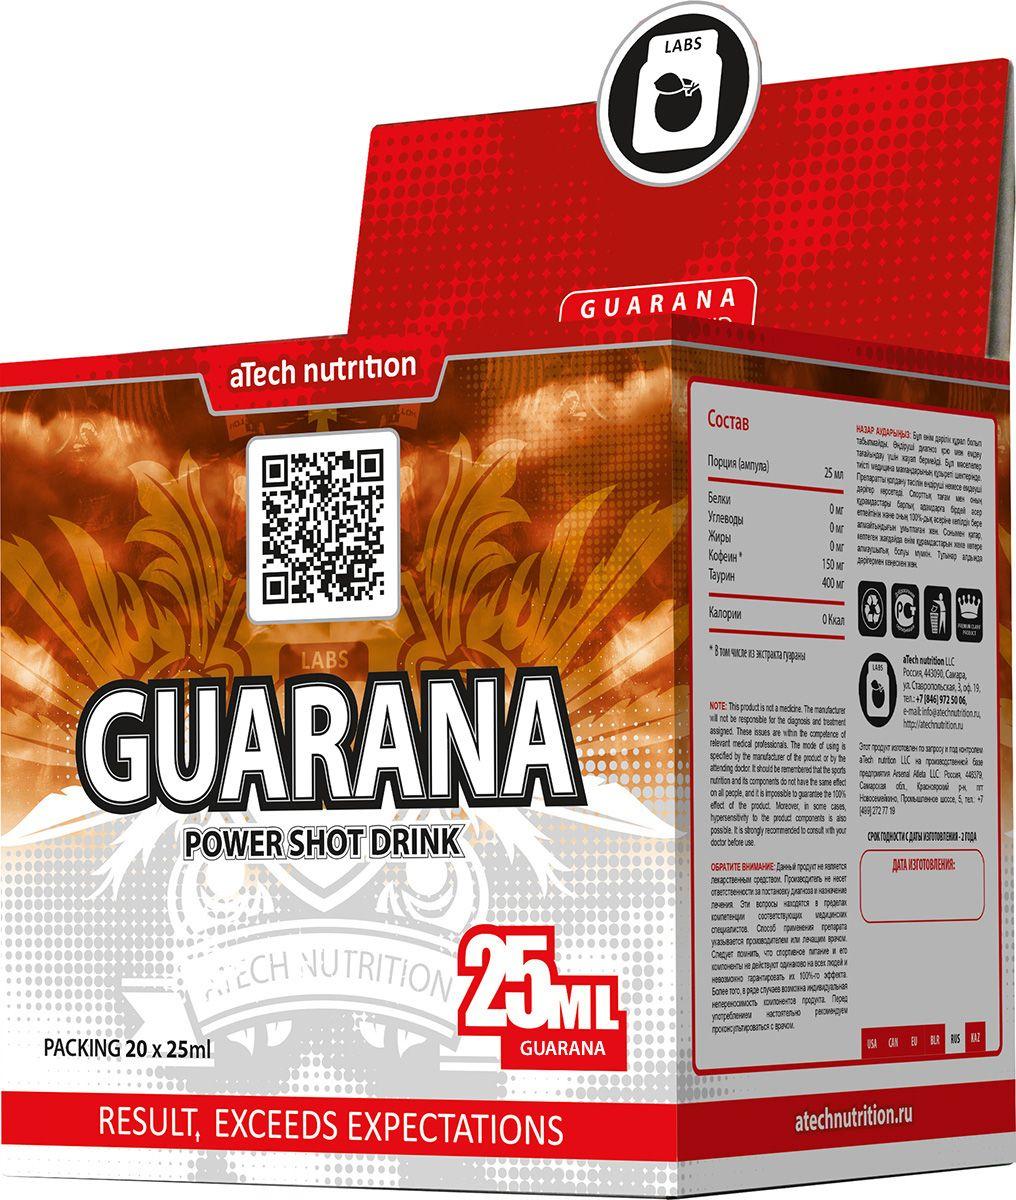 "Энергетический напиток aTech Nutrition ""Guarana Power Shot Drink"", гуарана, 25 мл, 20 шт"